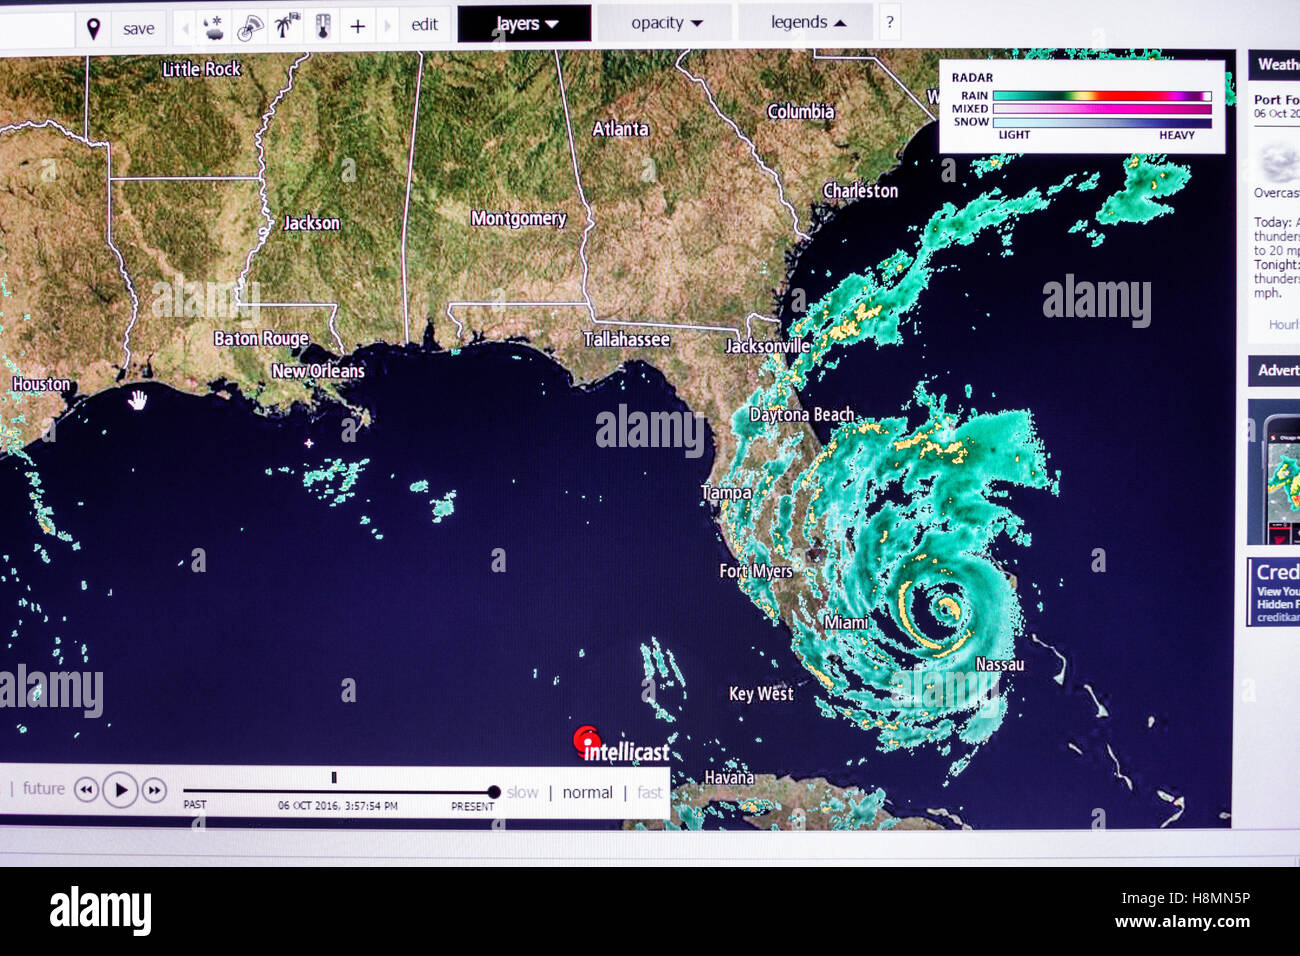 Nasa Daytona Beach Jacksonville Florida Are Getting